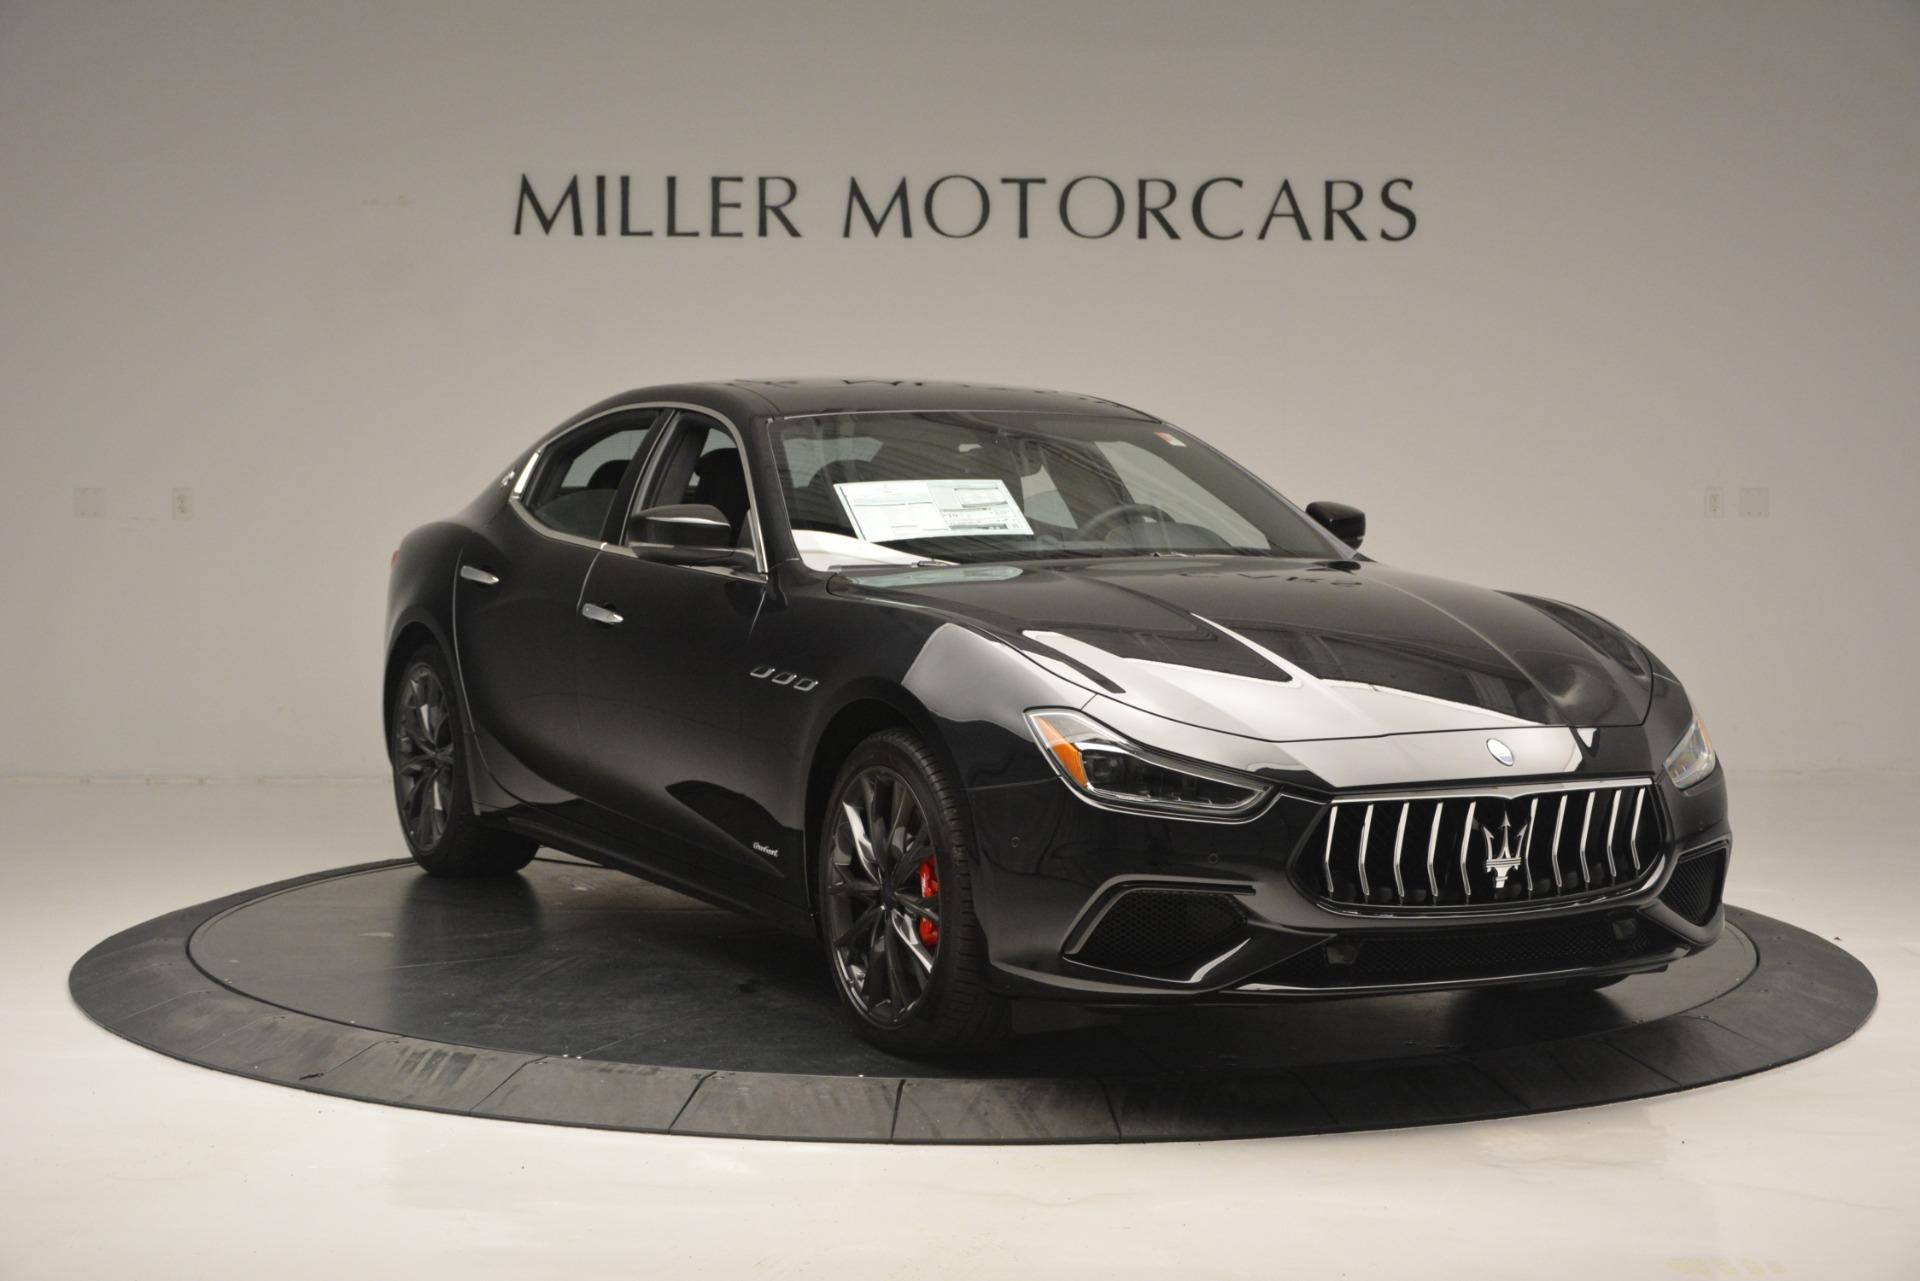 New 2019 Maserati Ghibli S Q4 GranSport For Sale In Greenwich, CT 2765_p11